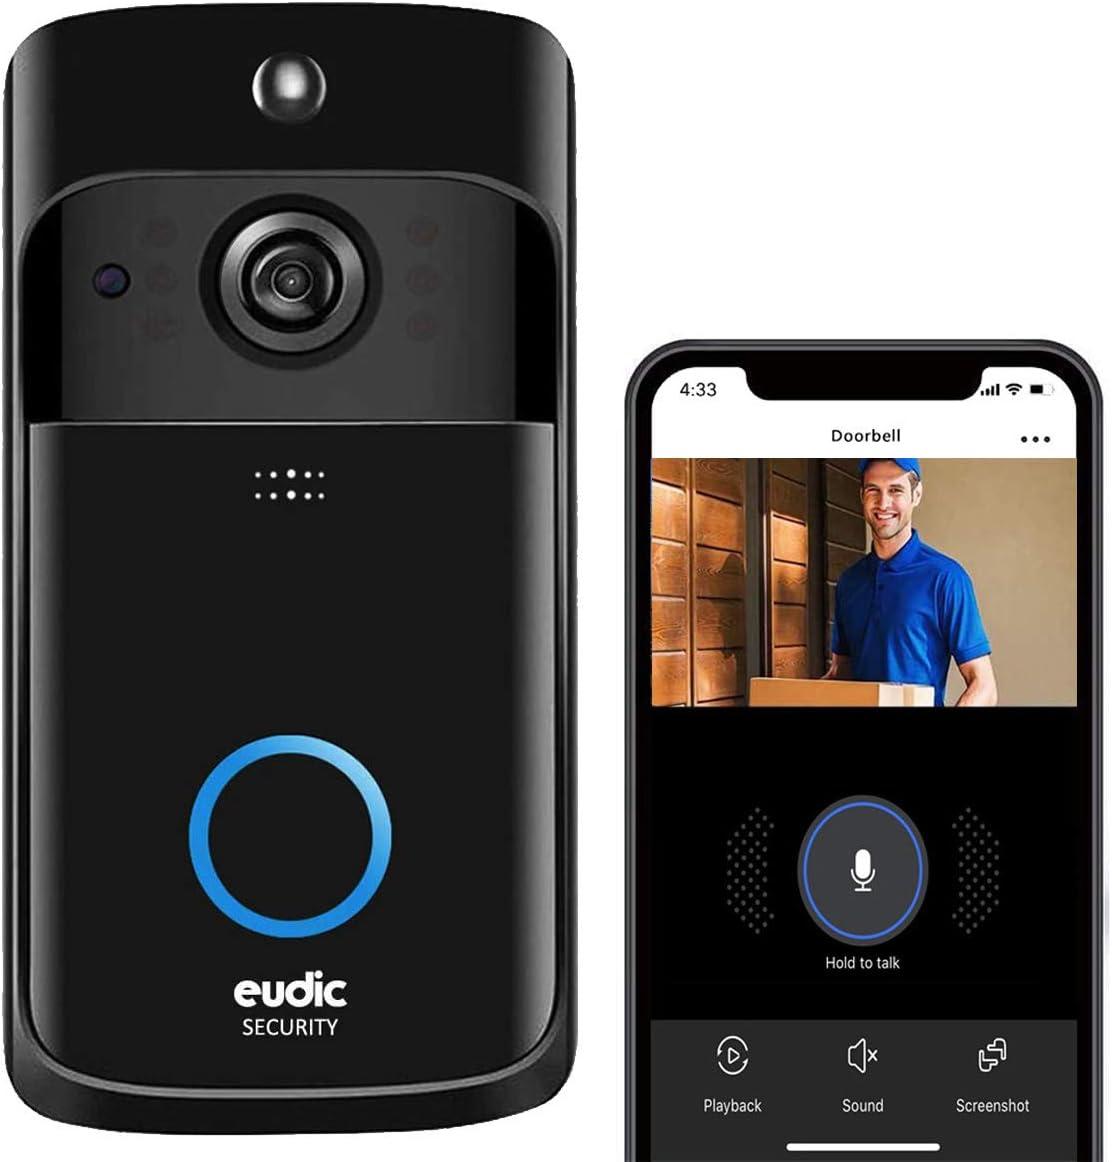 Video Doorbell Wireless WiFi Doorbell Camera IP5 Waterproof HD WiFi Security Camera Real-Time Video for iOS & Android Phone Night Light (Black) (Black)